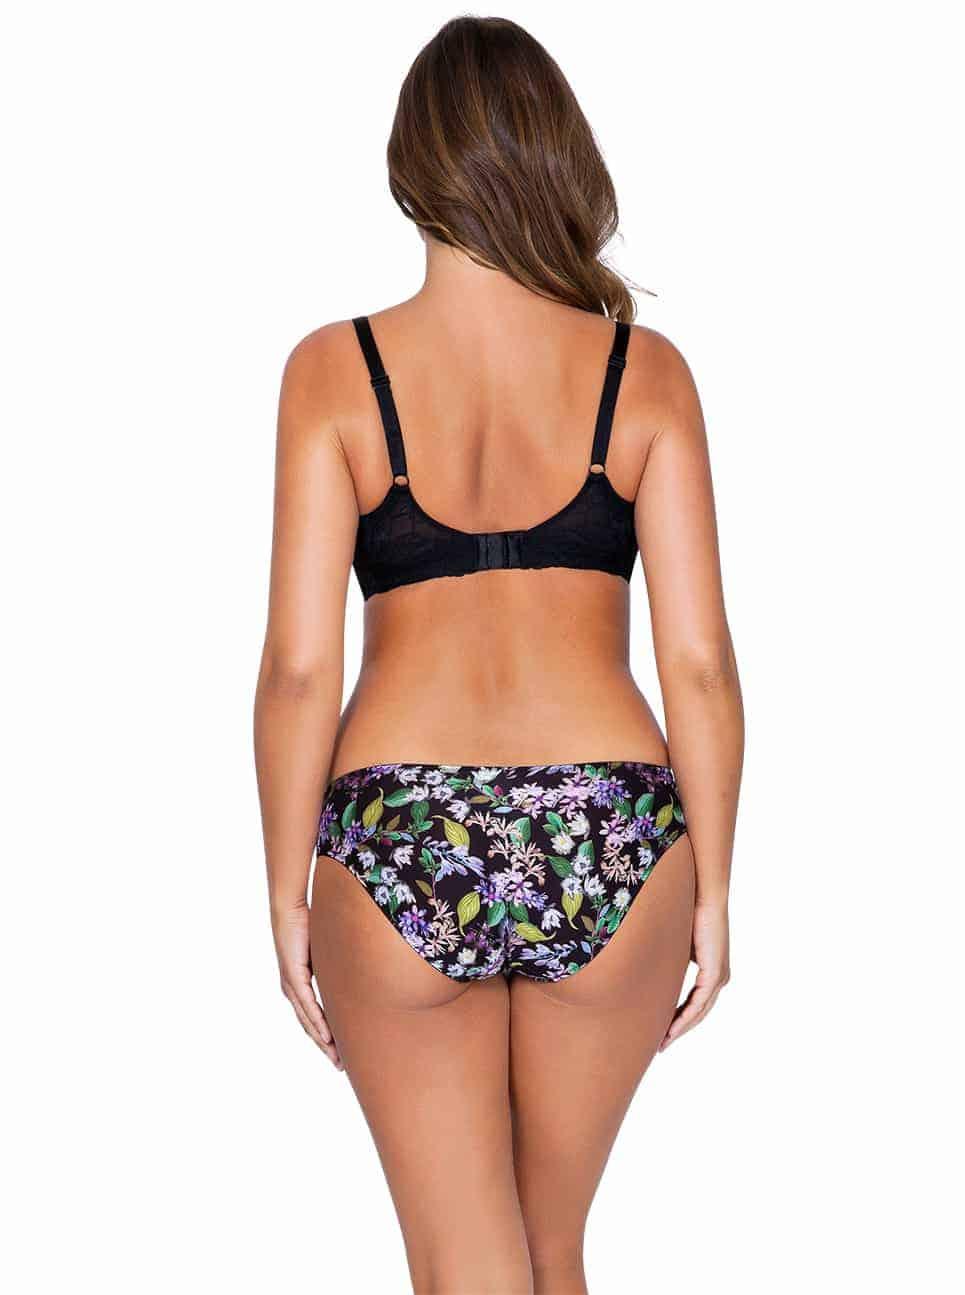 Ava P5371 PaddedBra P5373 BikiniBack - Ava Padded Bra - Black Floral - P5371